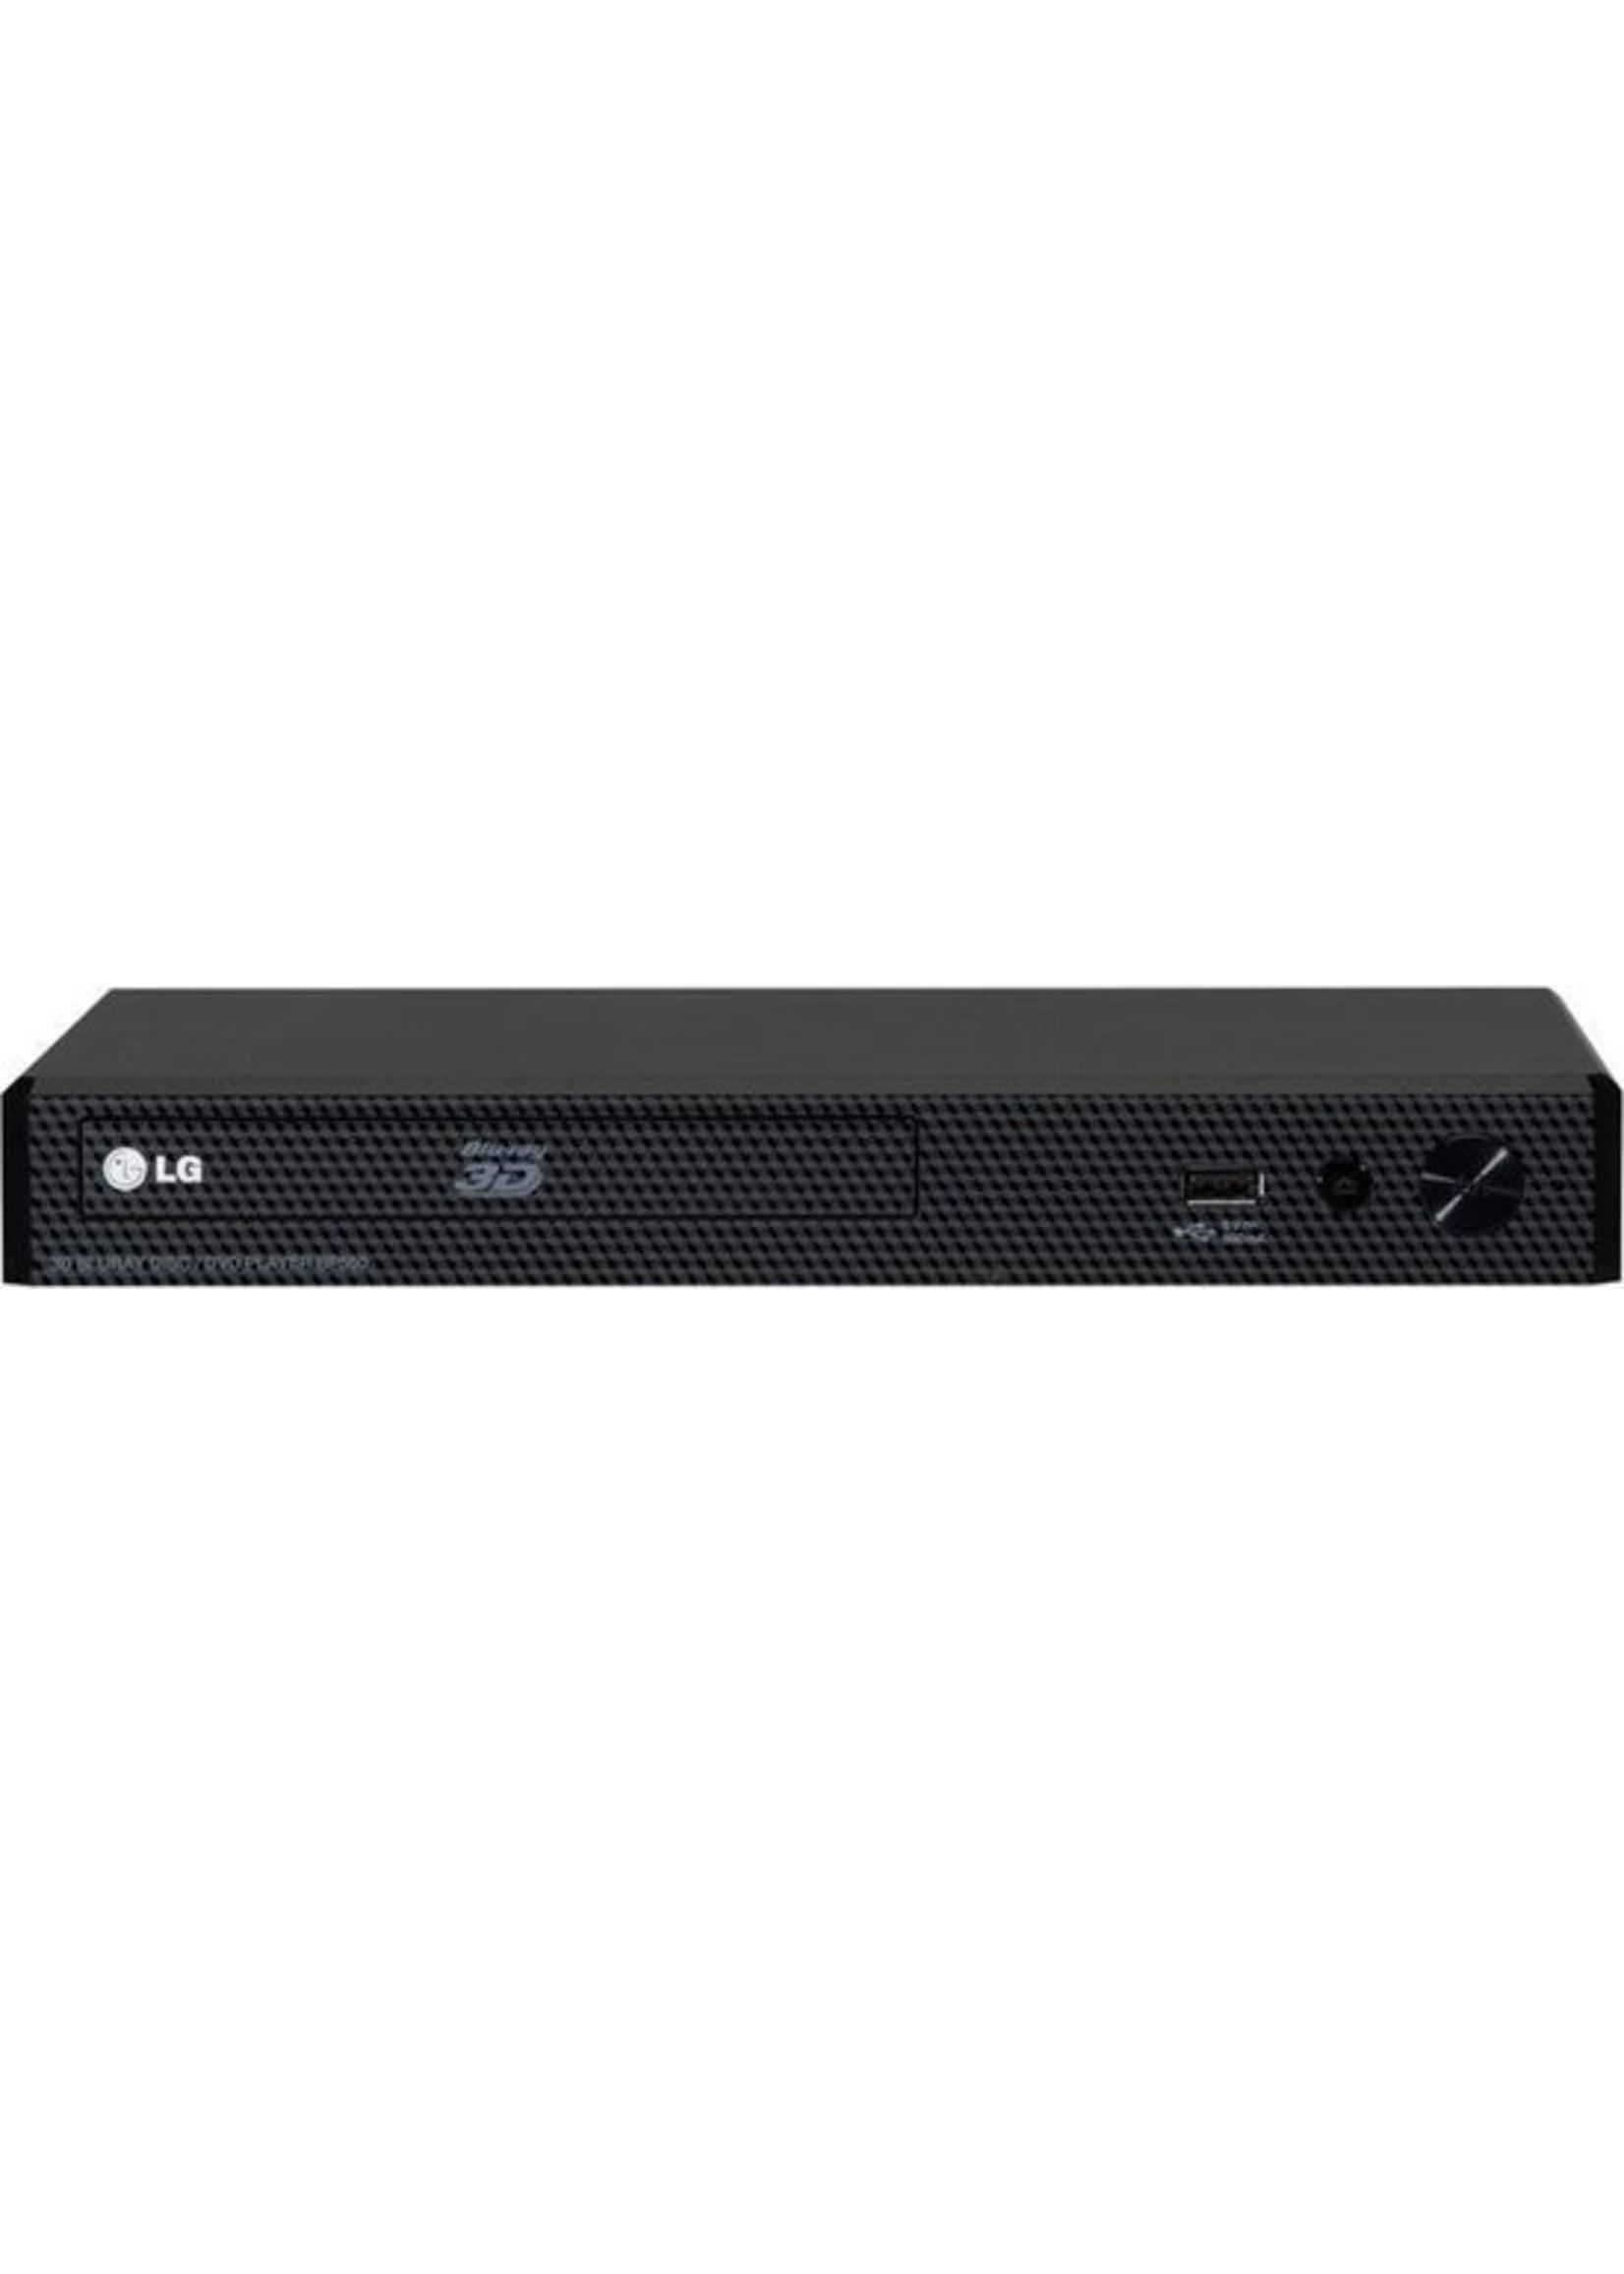 LG LG BP450 - Blu-ray speler - Zwart